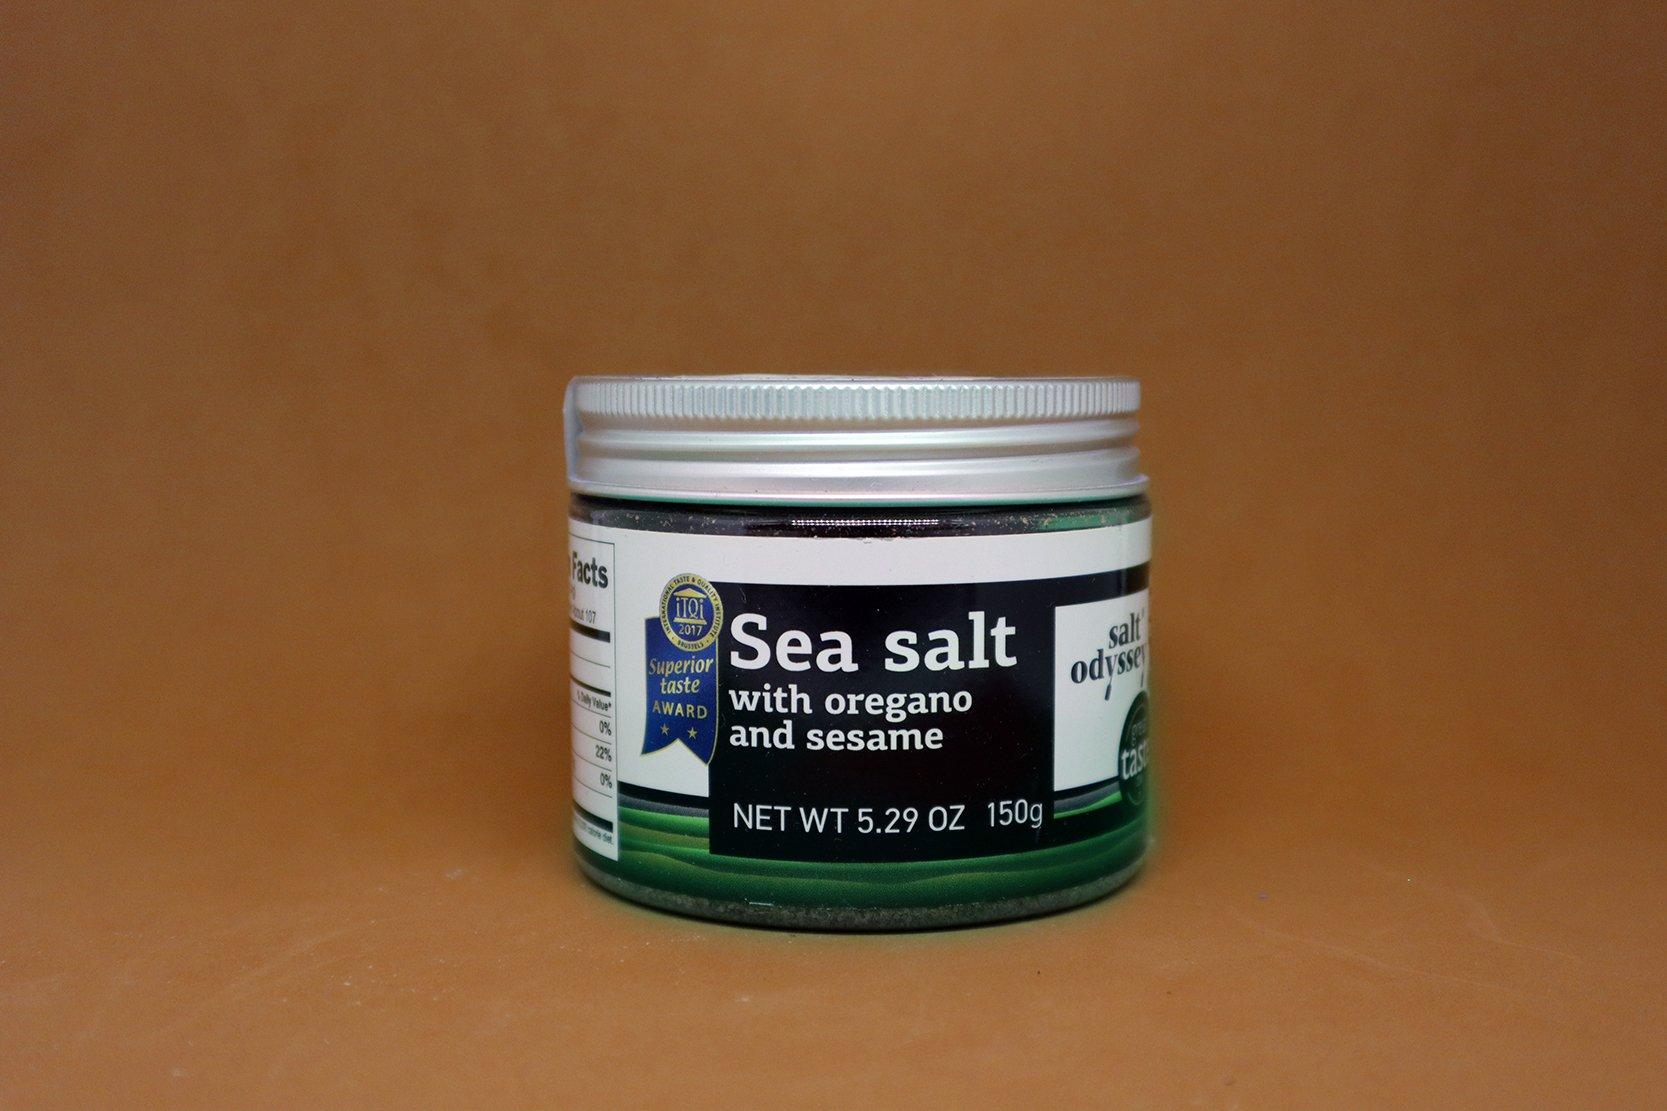 Sea Salt with Oregano and Sesame